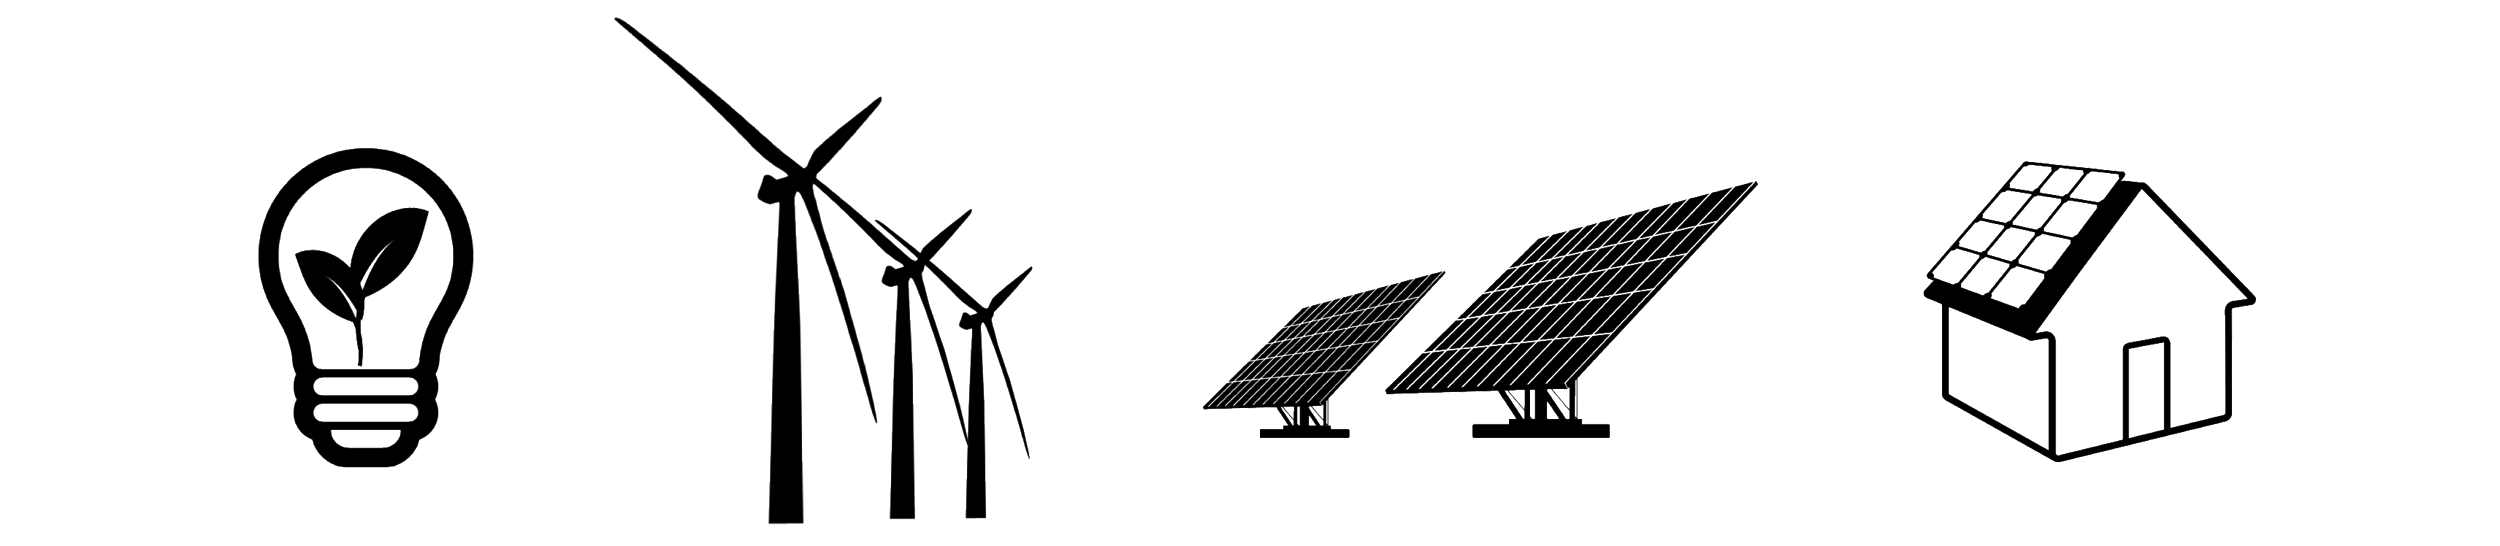 Renewable energy FAQ 2-01.png